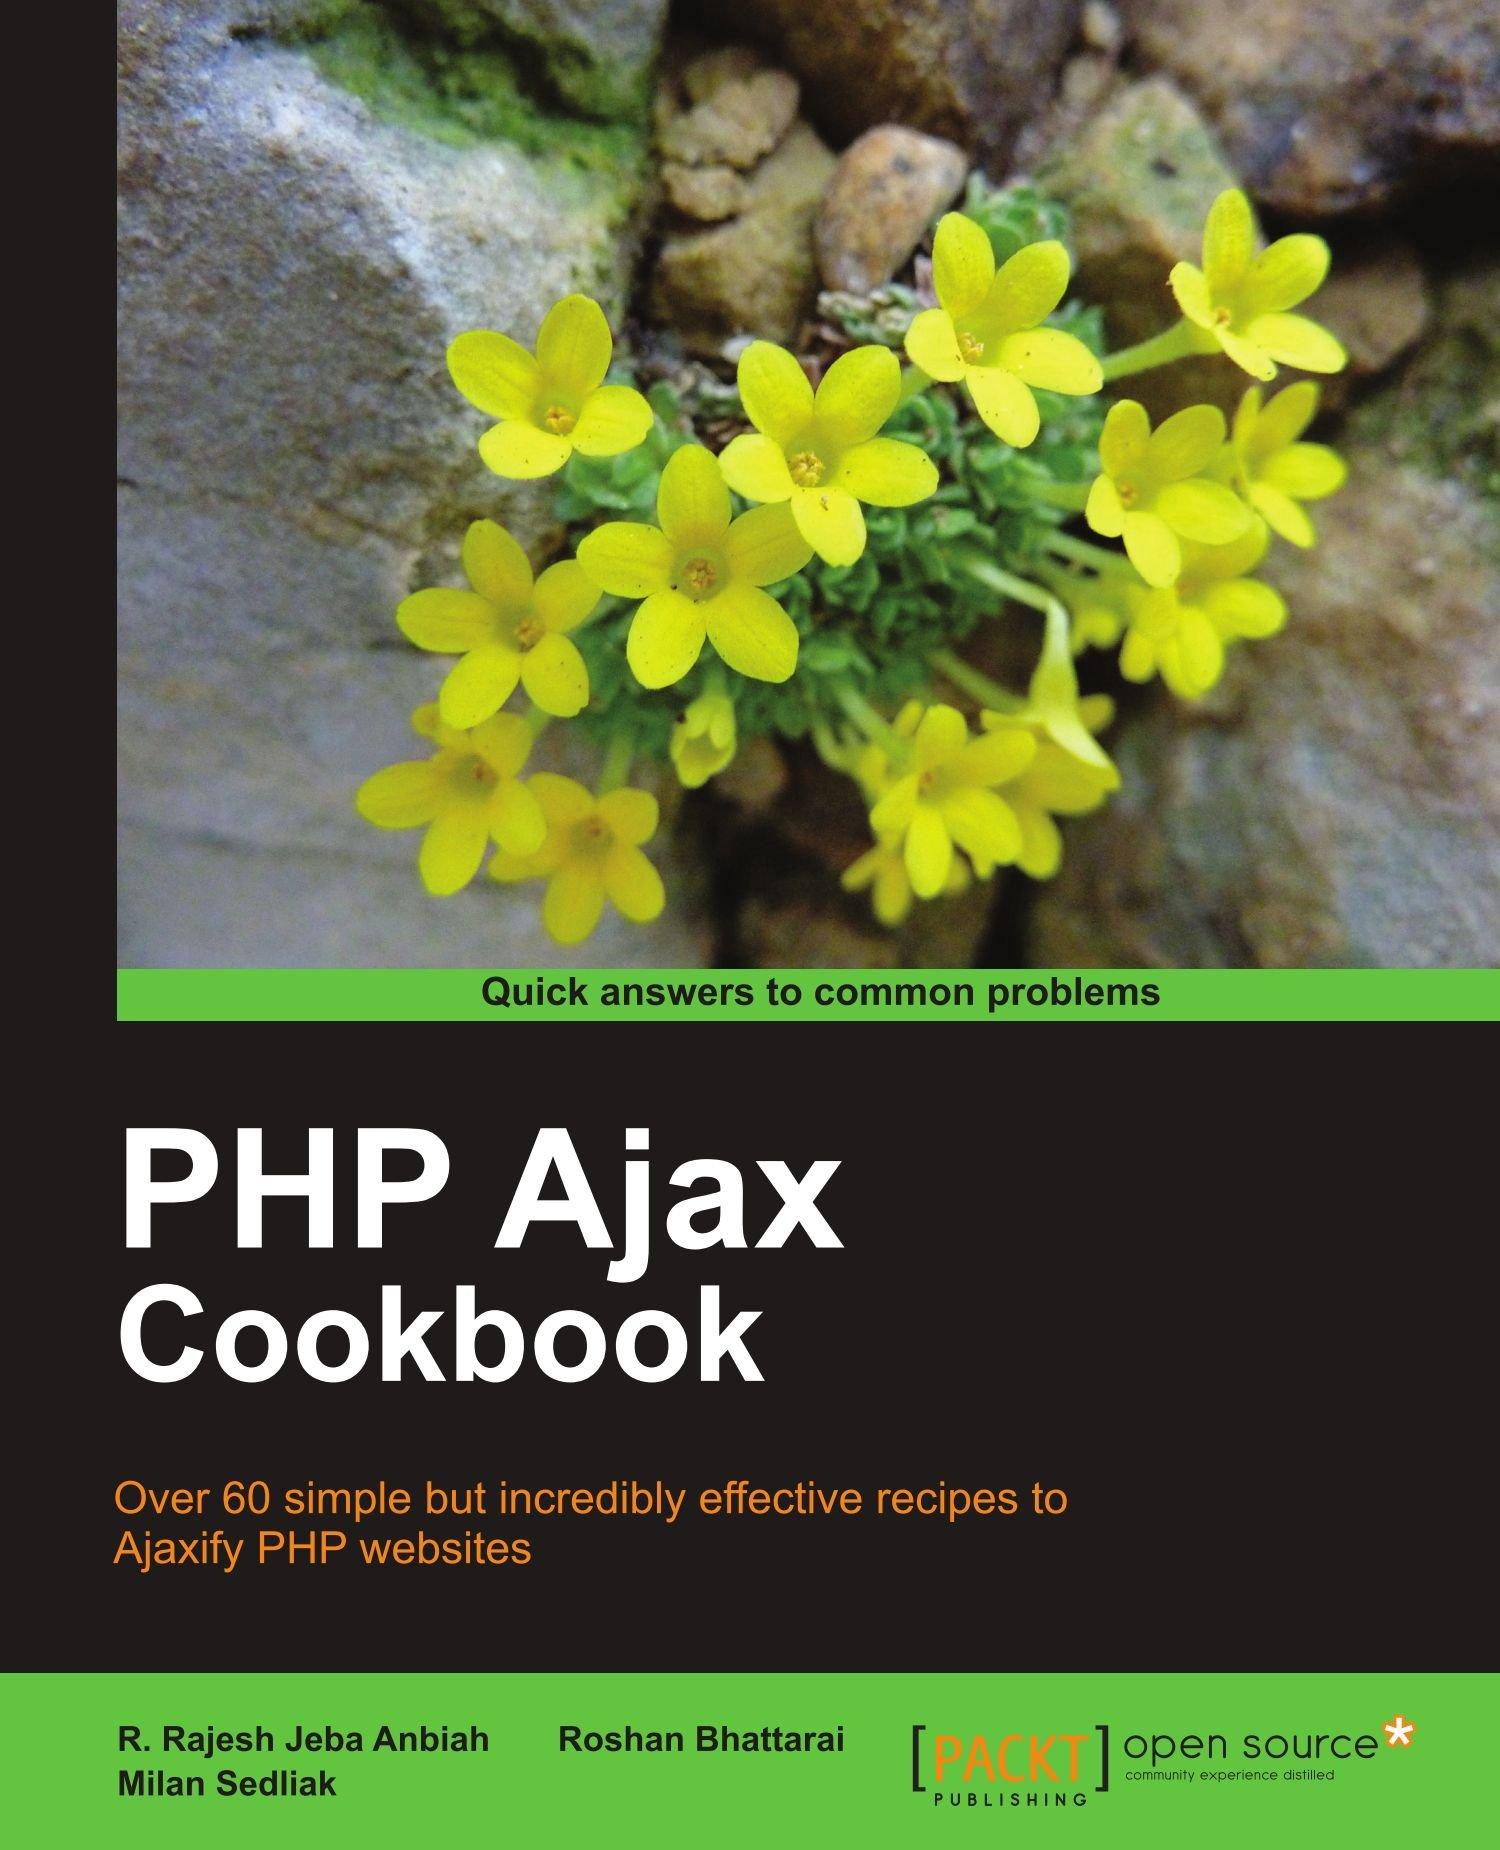 PHP Ajax Cookbook: Amazon.es: Milan Sedliak, R. Rajesh Jeba Anbiah, Roshan Bhattarai: Libros en idiomas extranjeros